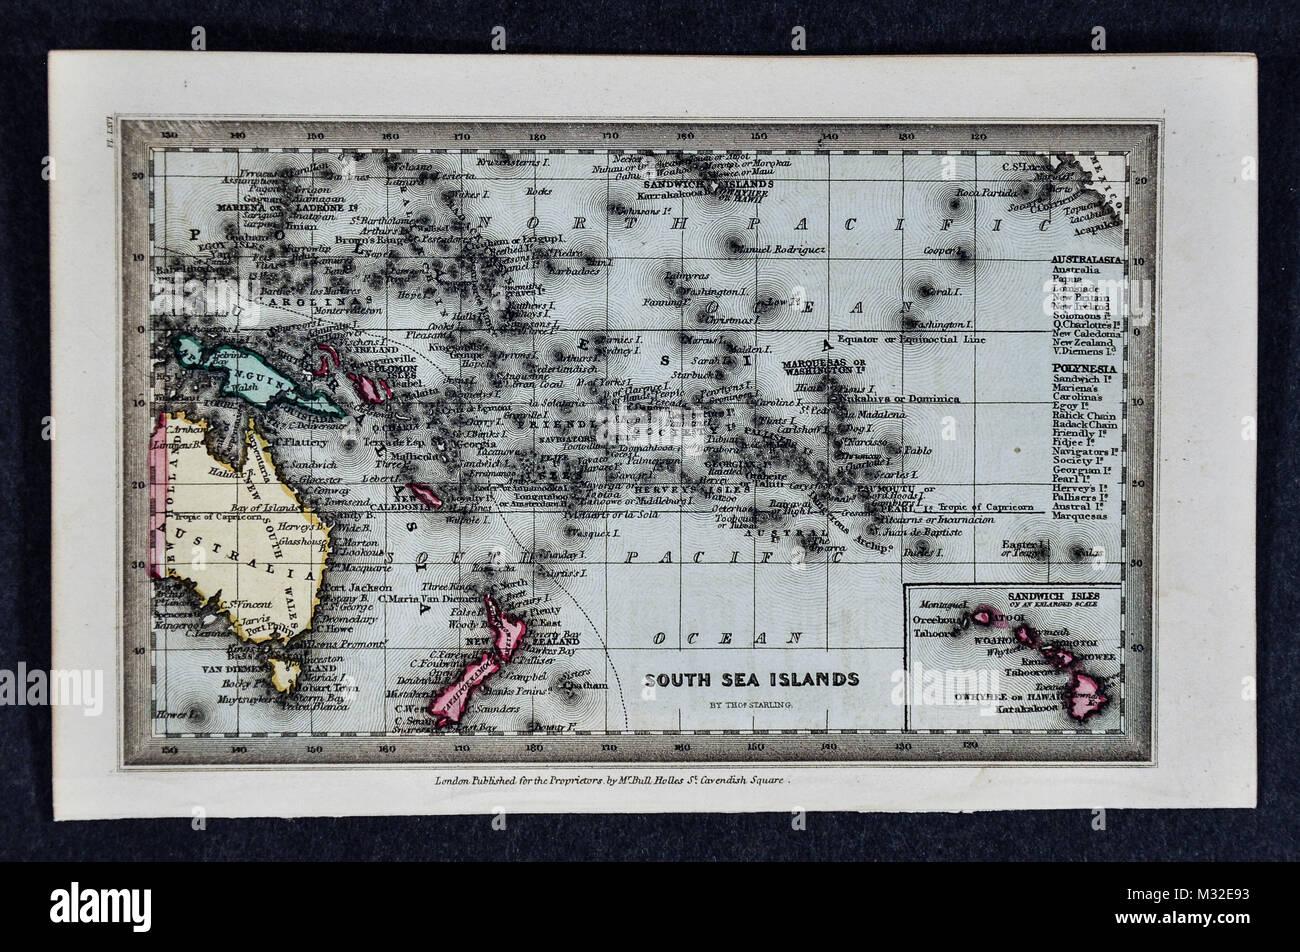 Starling 1834 Map - Oceania - Australia New Zealand Hawaii Polynesia South Pacific - Stock Image